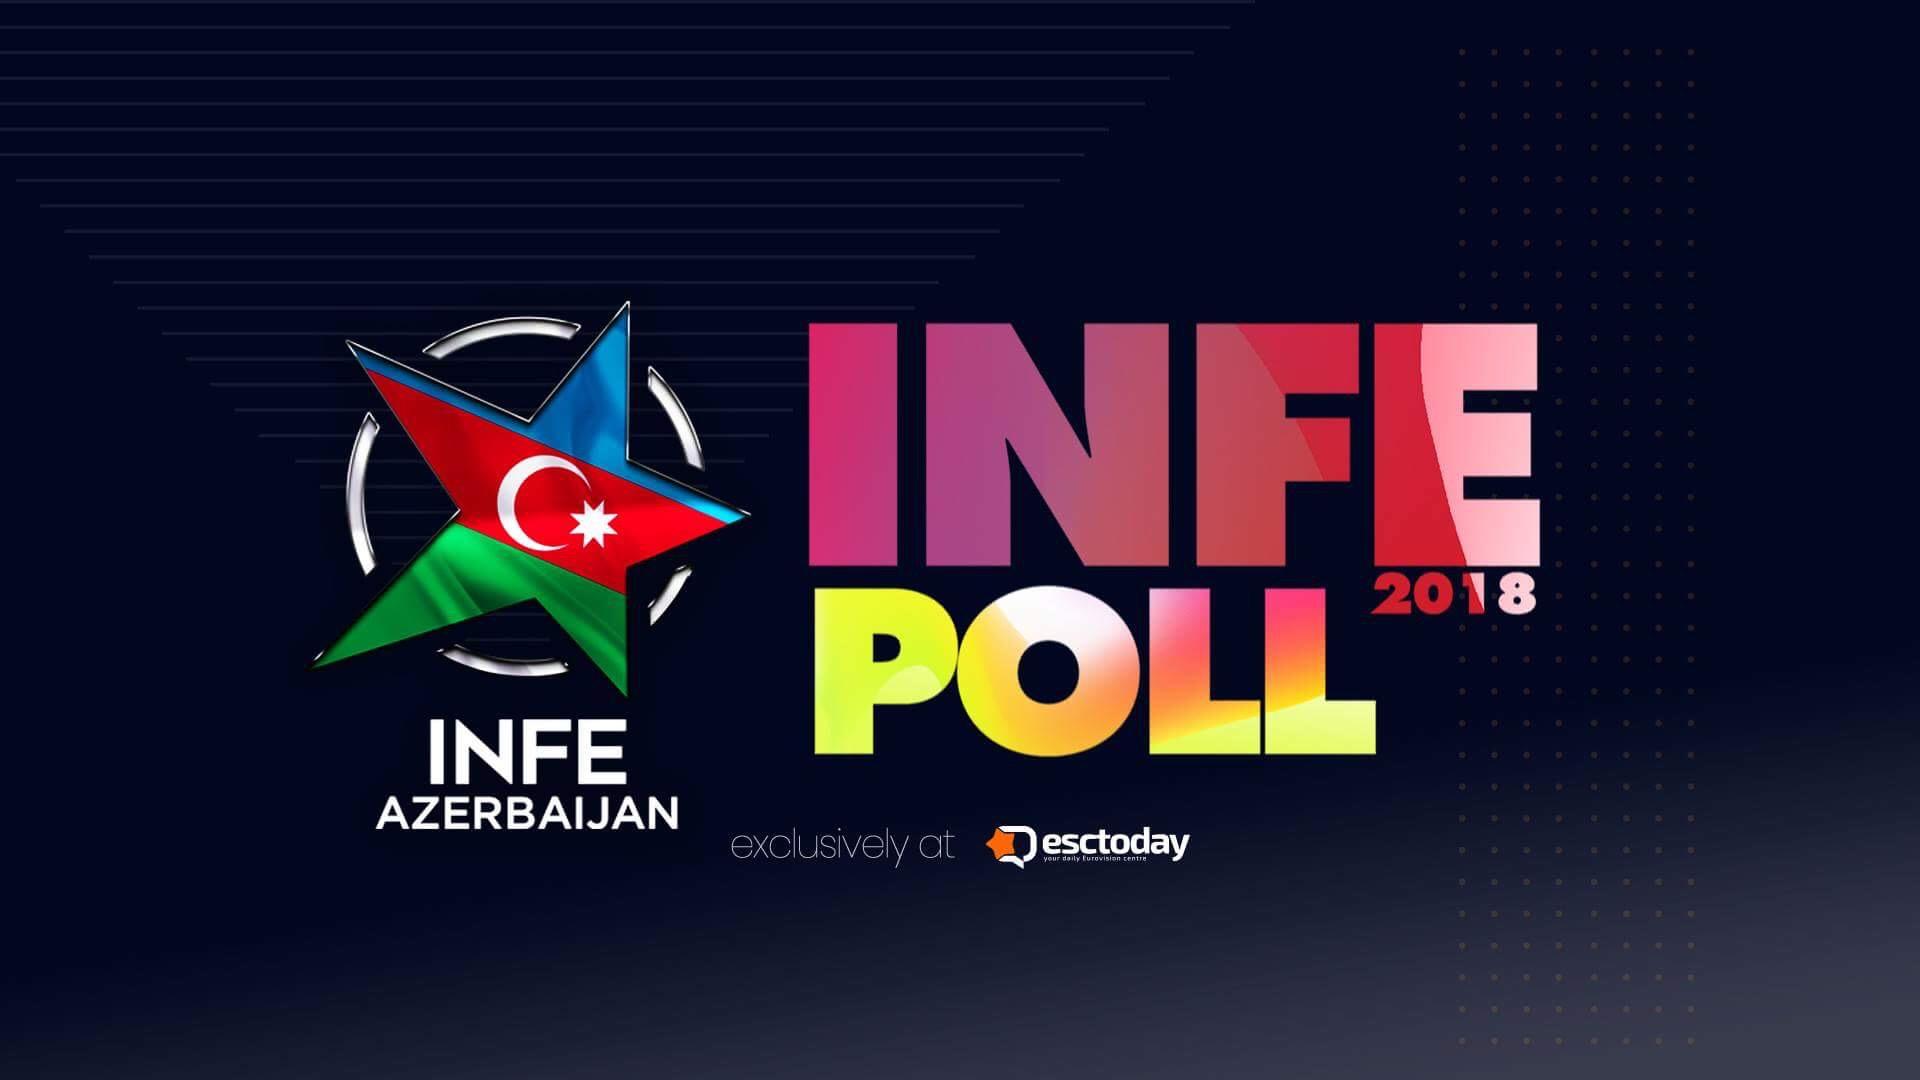 Eurovision INFE Poll 2018: INFE Azerbaijan reveals its votes